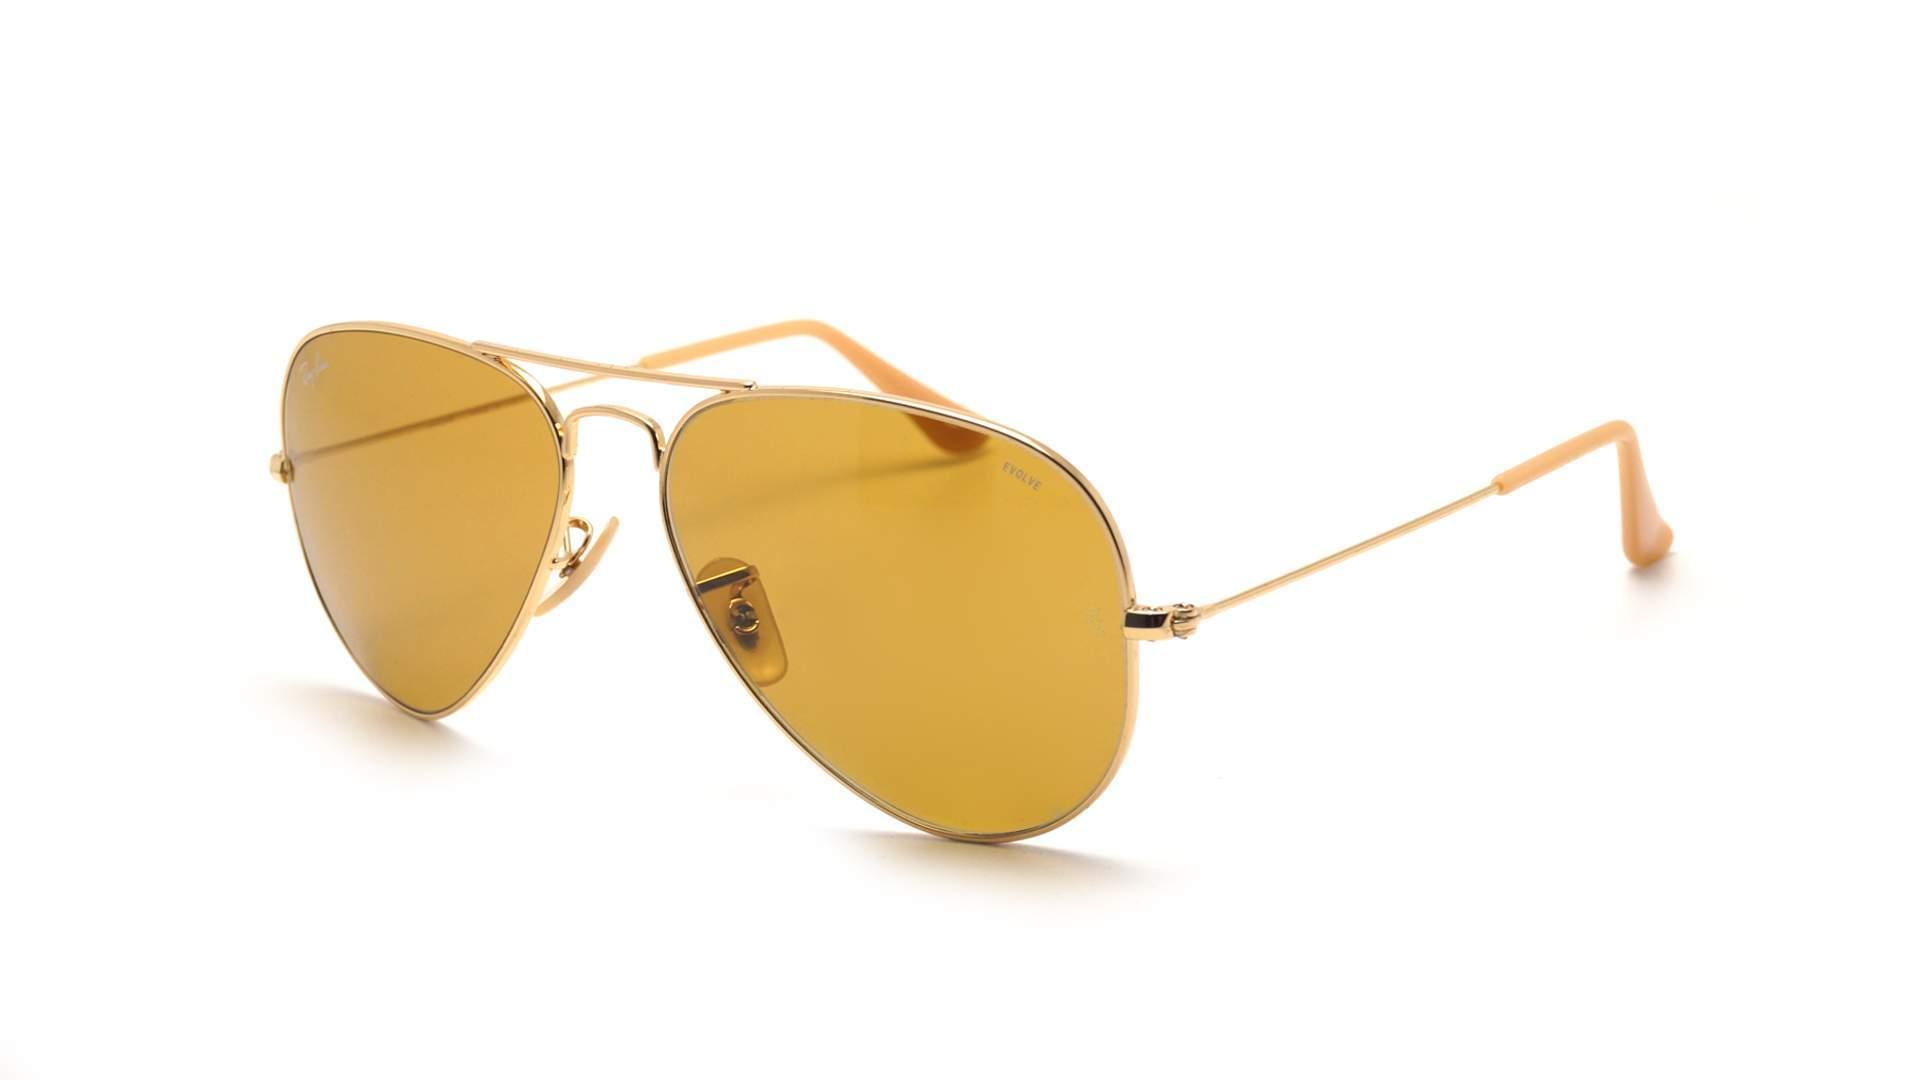 bfbce33aad Sunglasses Ray-Ban Aviator Evolve Gold RB3025 9064/4I 55-14 Medium  Photochromic